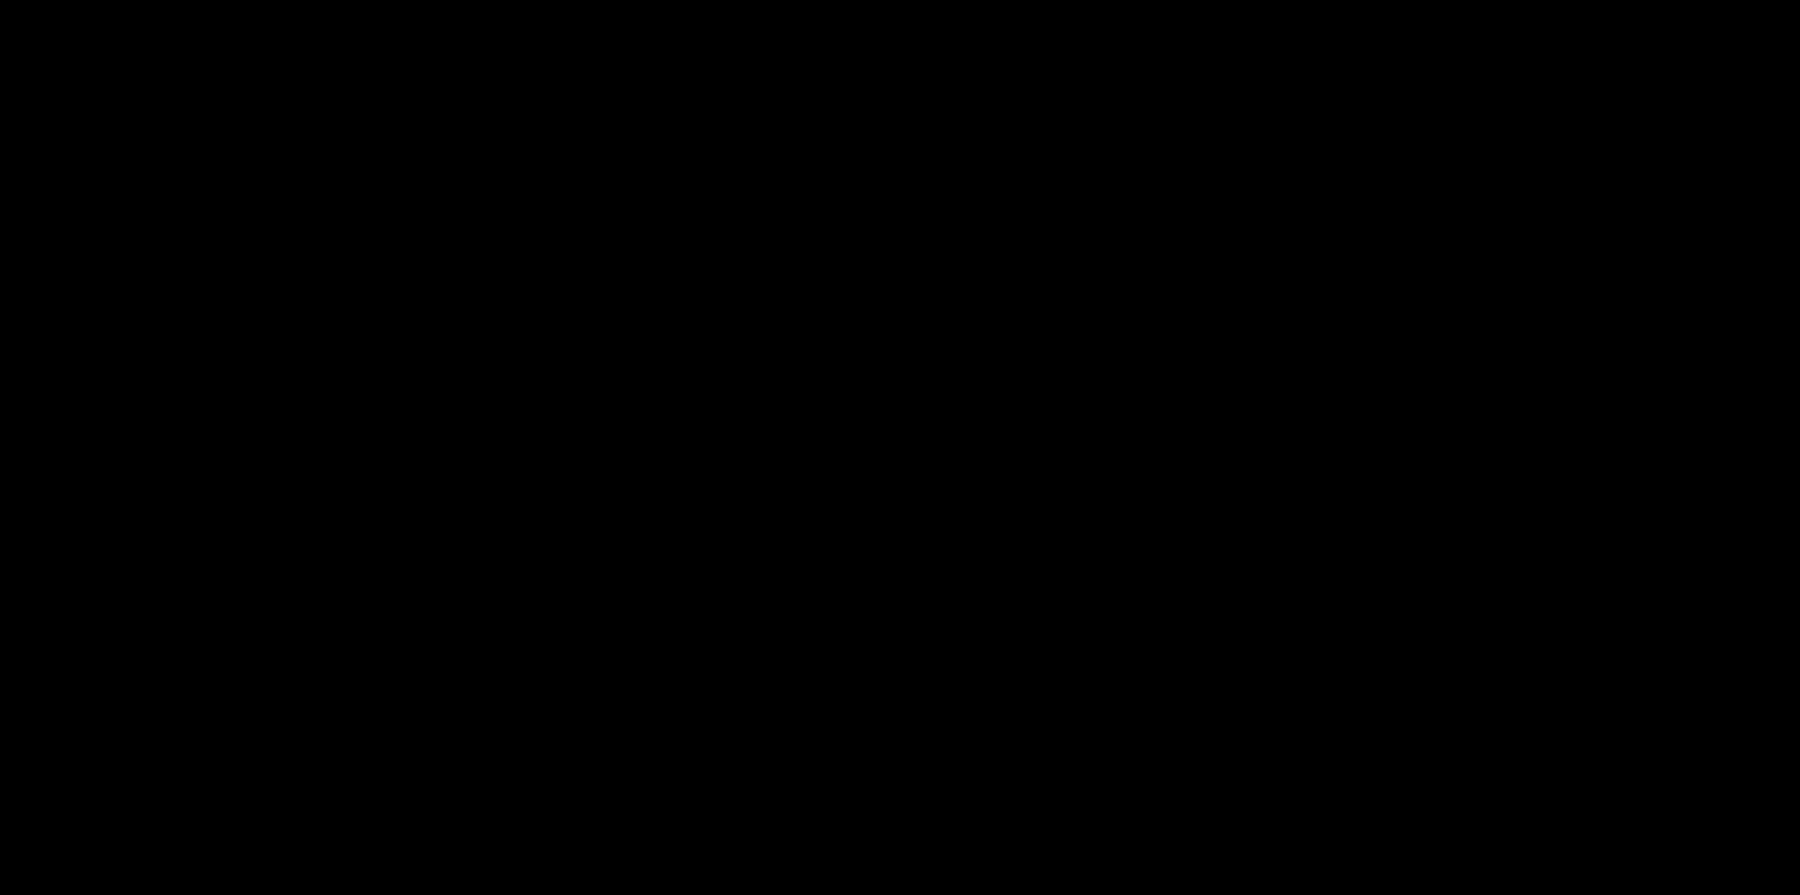 black test rectangle